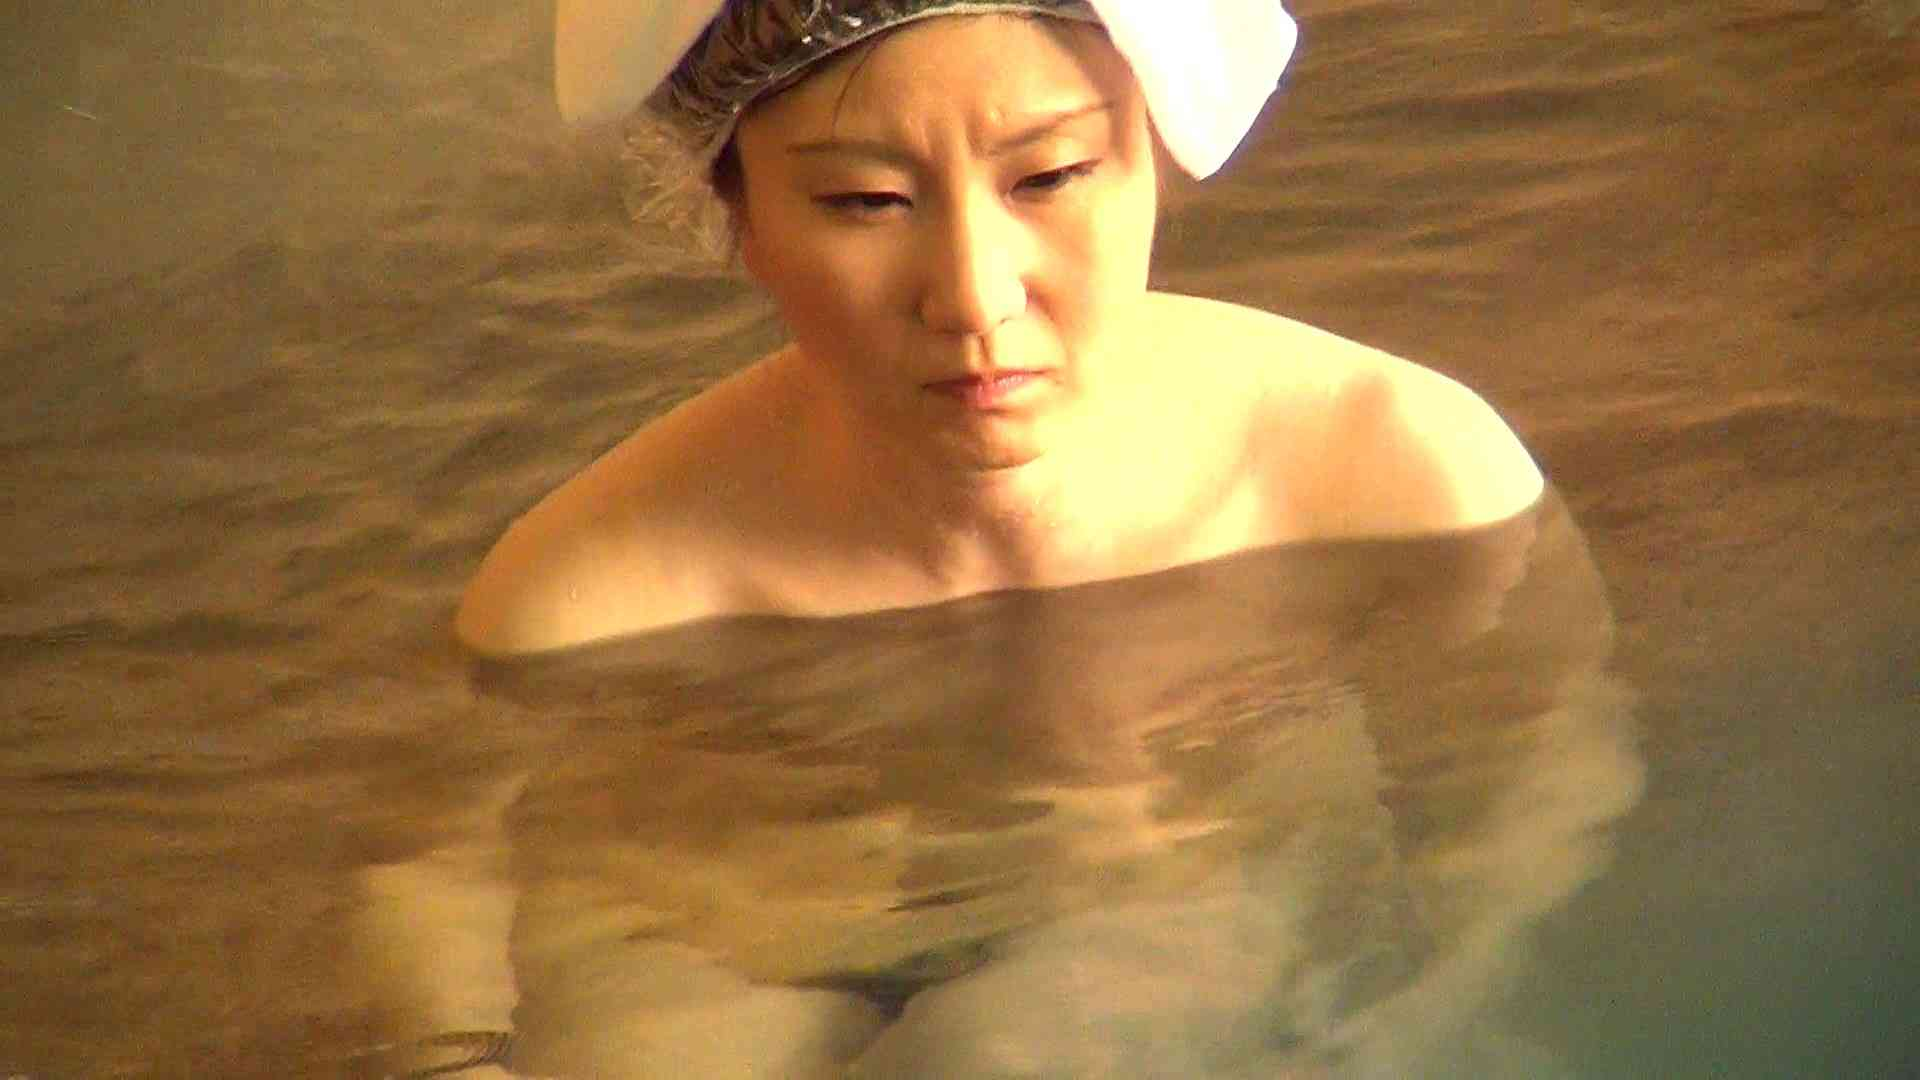 Aquaな露天風呂Vol.278 盗撮シリーズ | 露天風呂編  100PIX 61